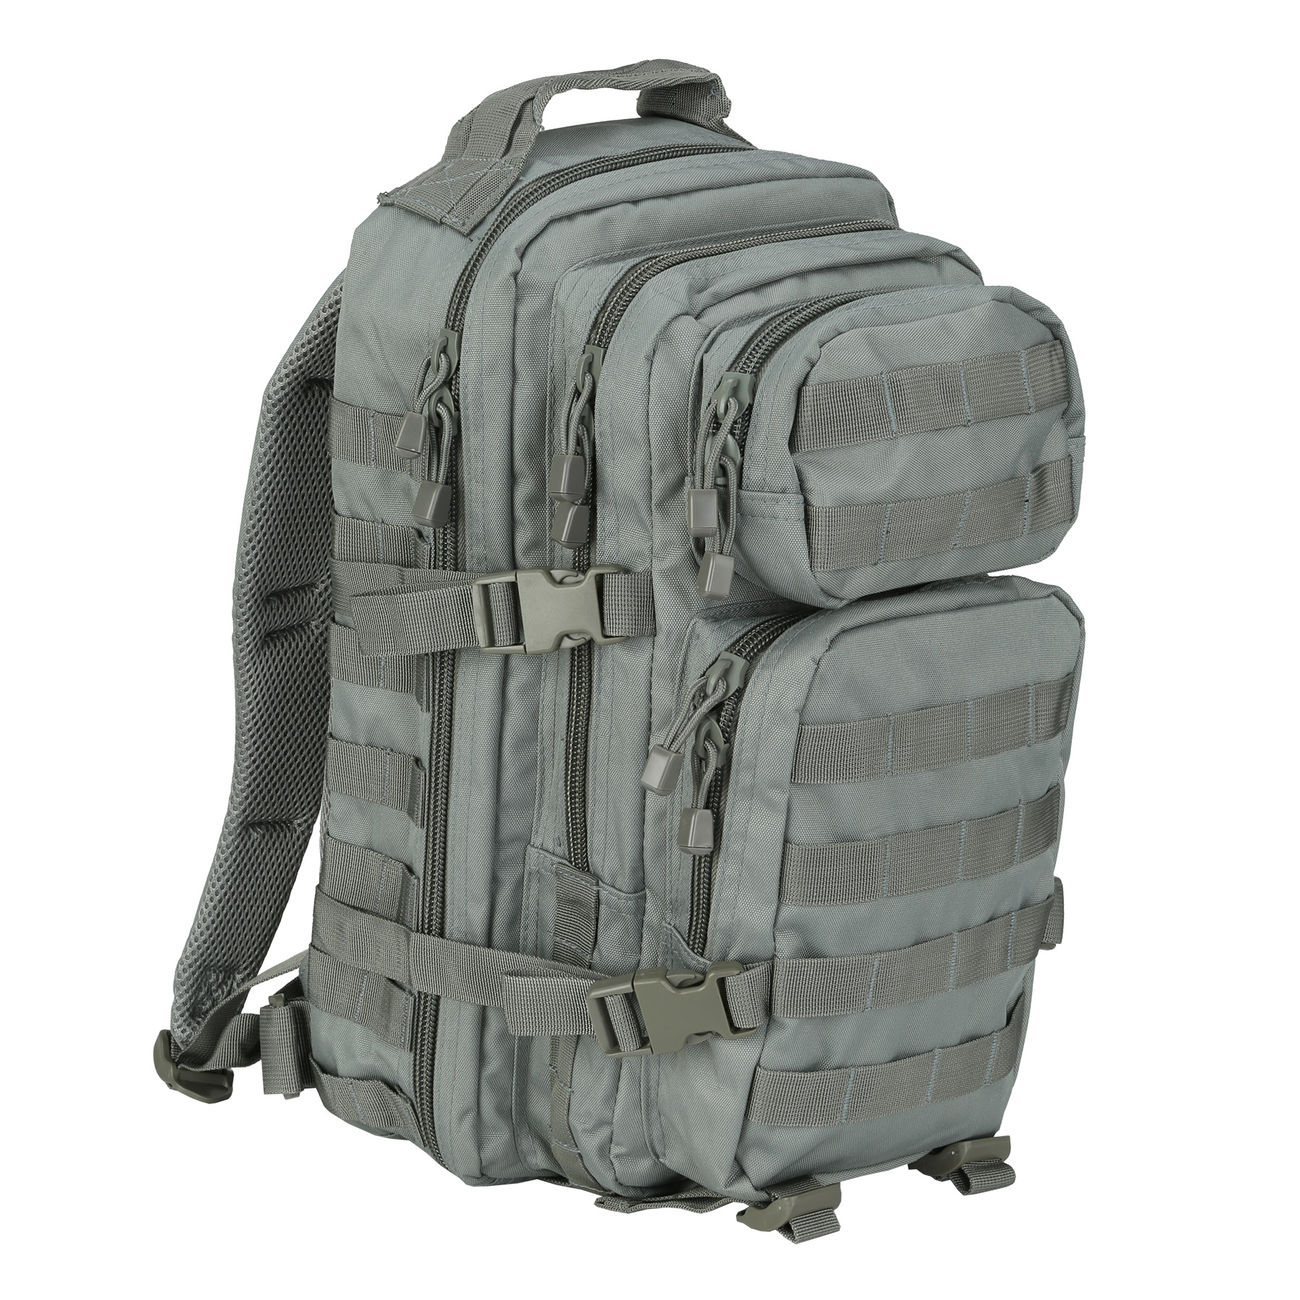 be2f84ba02814 Mil-Tec Rucksack US Assault Pack I 20 Liter foliage günstig kaufen ...